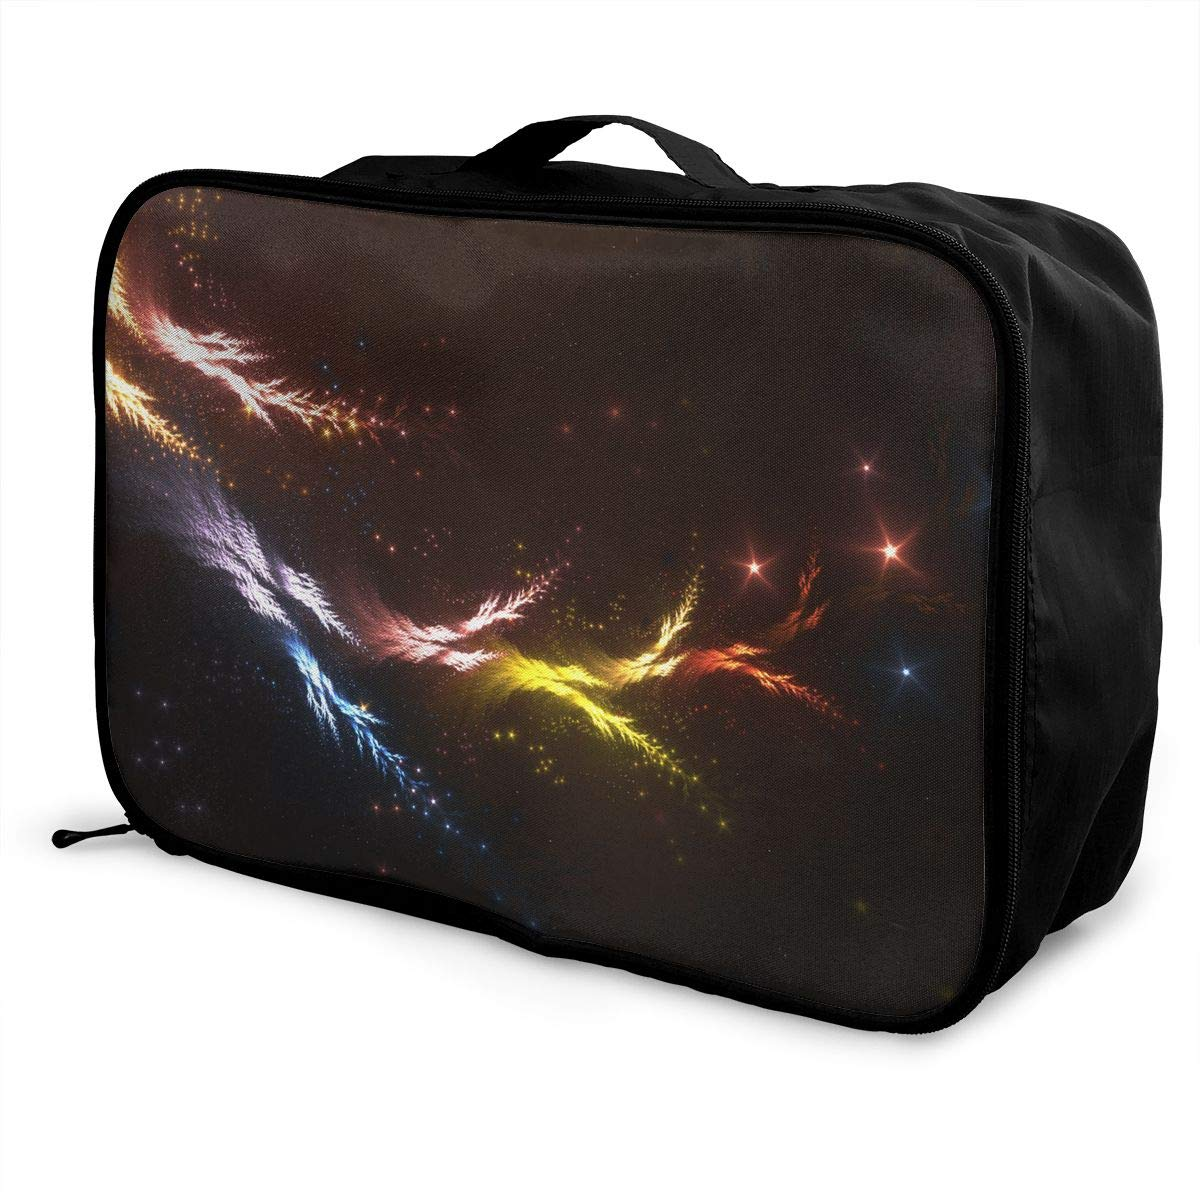 Travel Luggage Duffle Bag Lightweight Portable Handbag Fantasy Print Large Capacity Waterproof Foldable Storage Tote